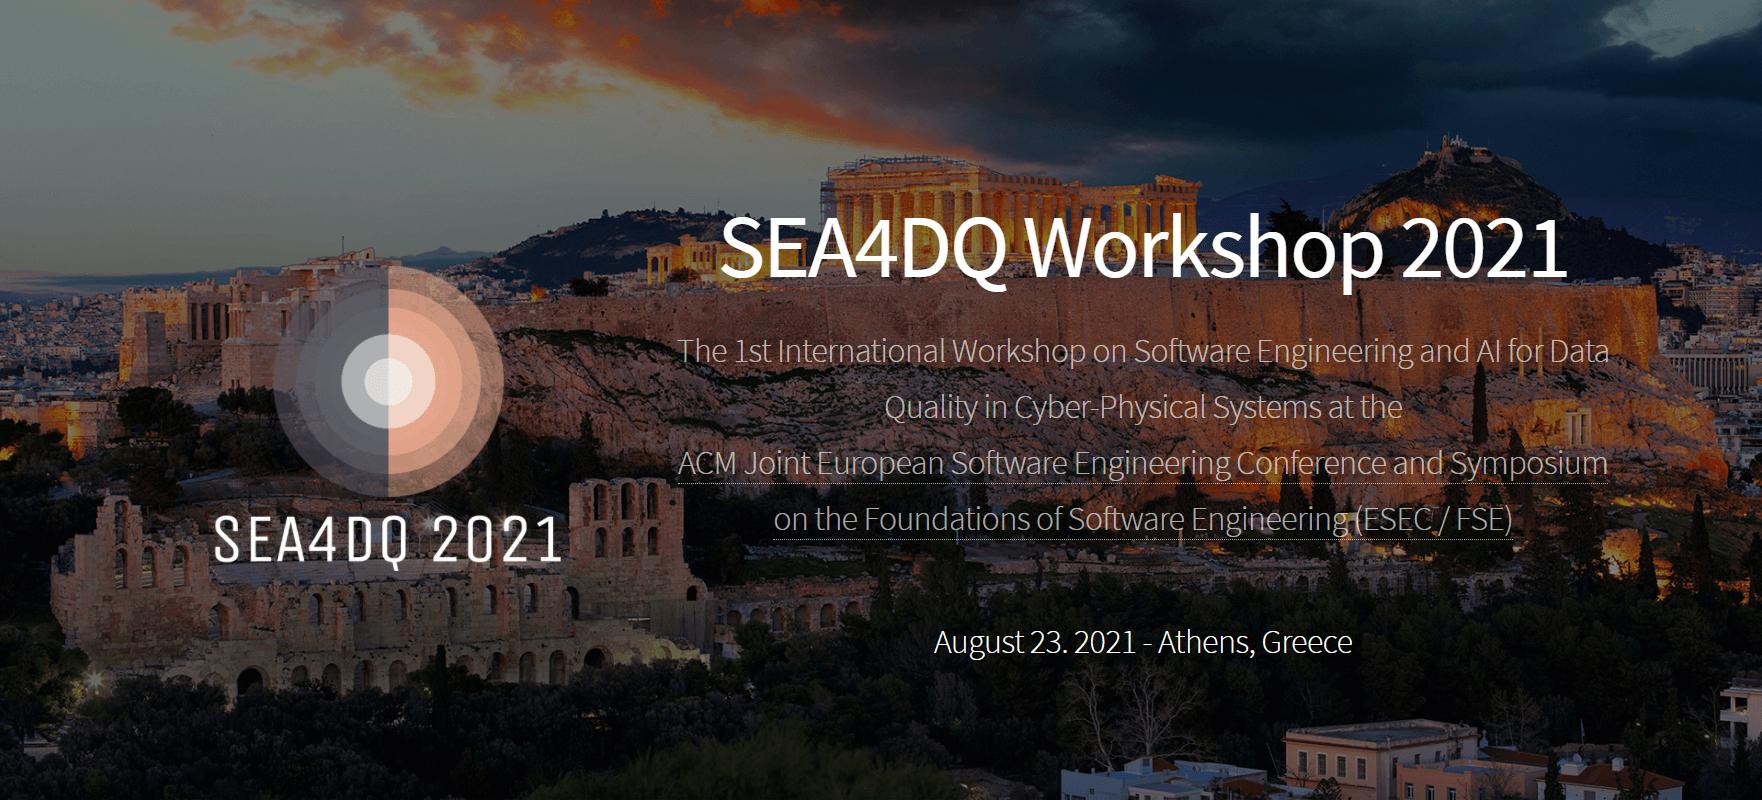 SEA4DQ workshop